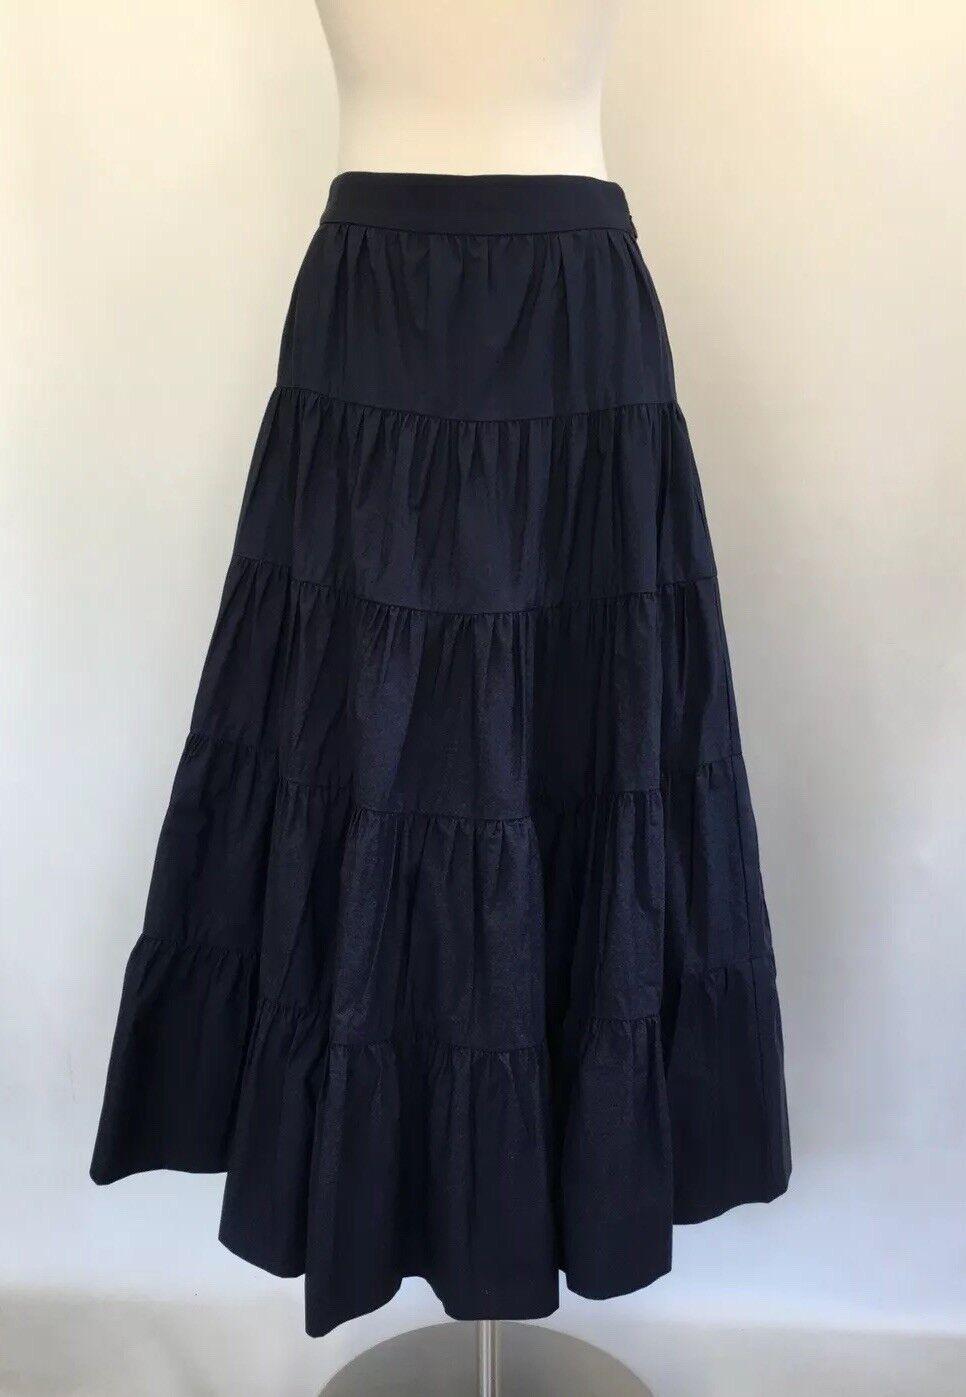 New J Crew Tiered Midi Skirt in Cotton Poplin Navy bluee Sz 00 H7766